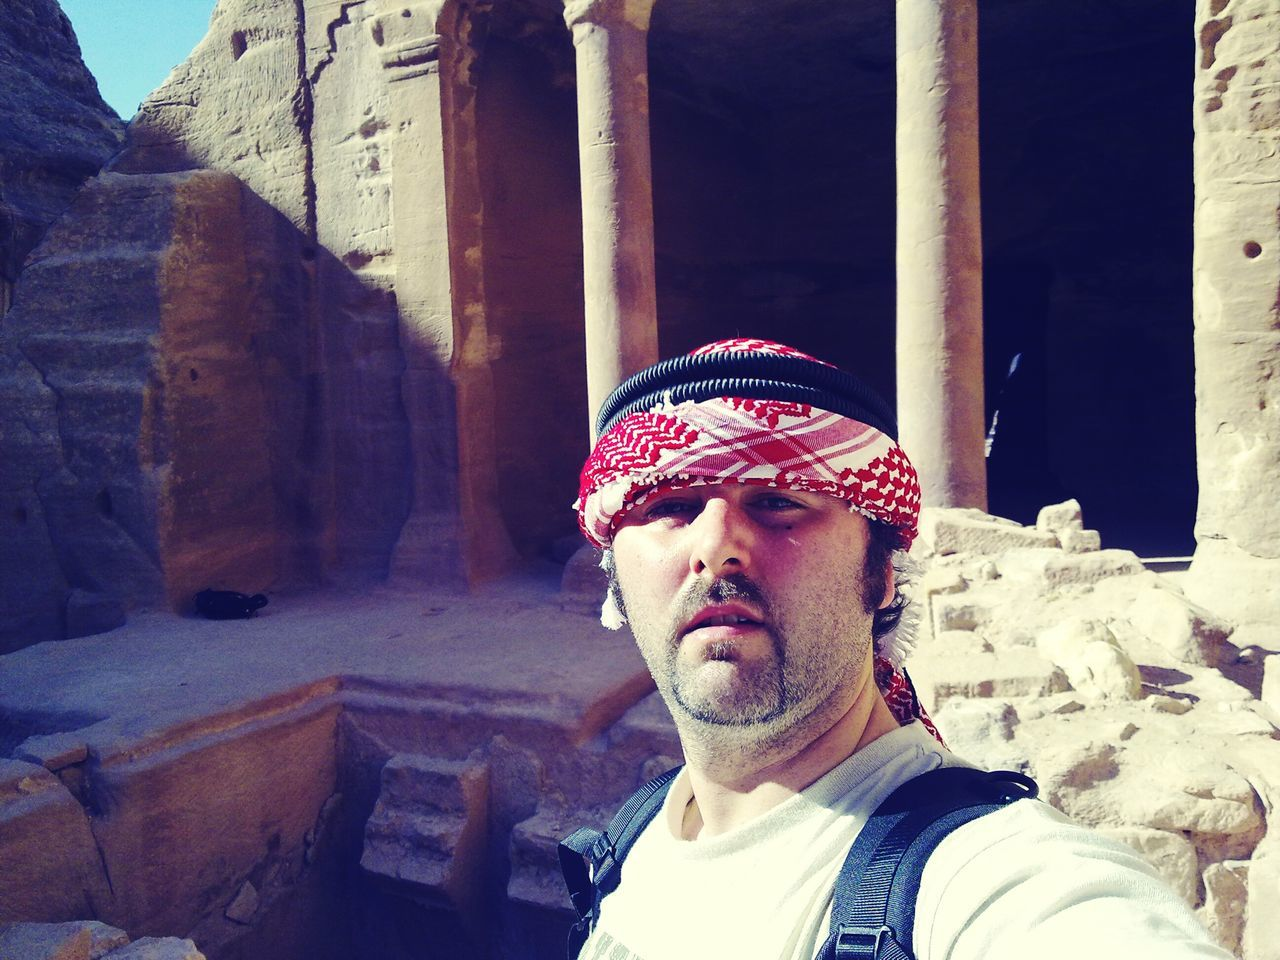 Architecture Petra, Jordan Petra Deserted Lost Place Verlassener Ort Miles Away Stein Stone Human Lips Beard One Man Only Day Uniqueness Alt Architektur EyeEm Traveling